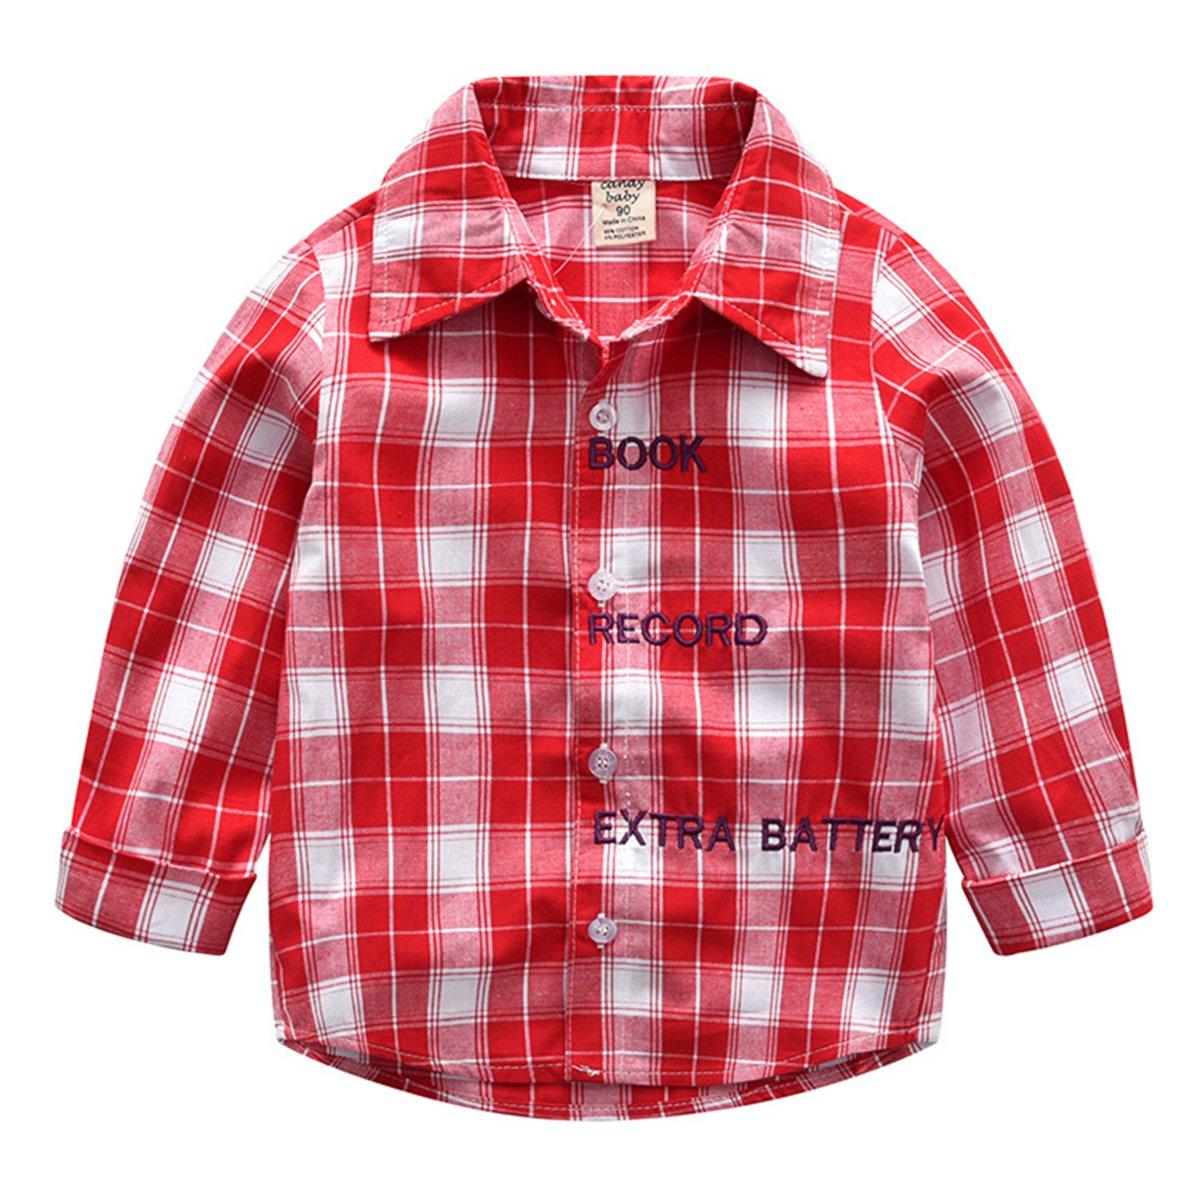 Jeans Pants Set Milkiwai 2Pcs Boy Outfit Long Sleeve Plaid Shirt